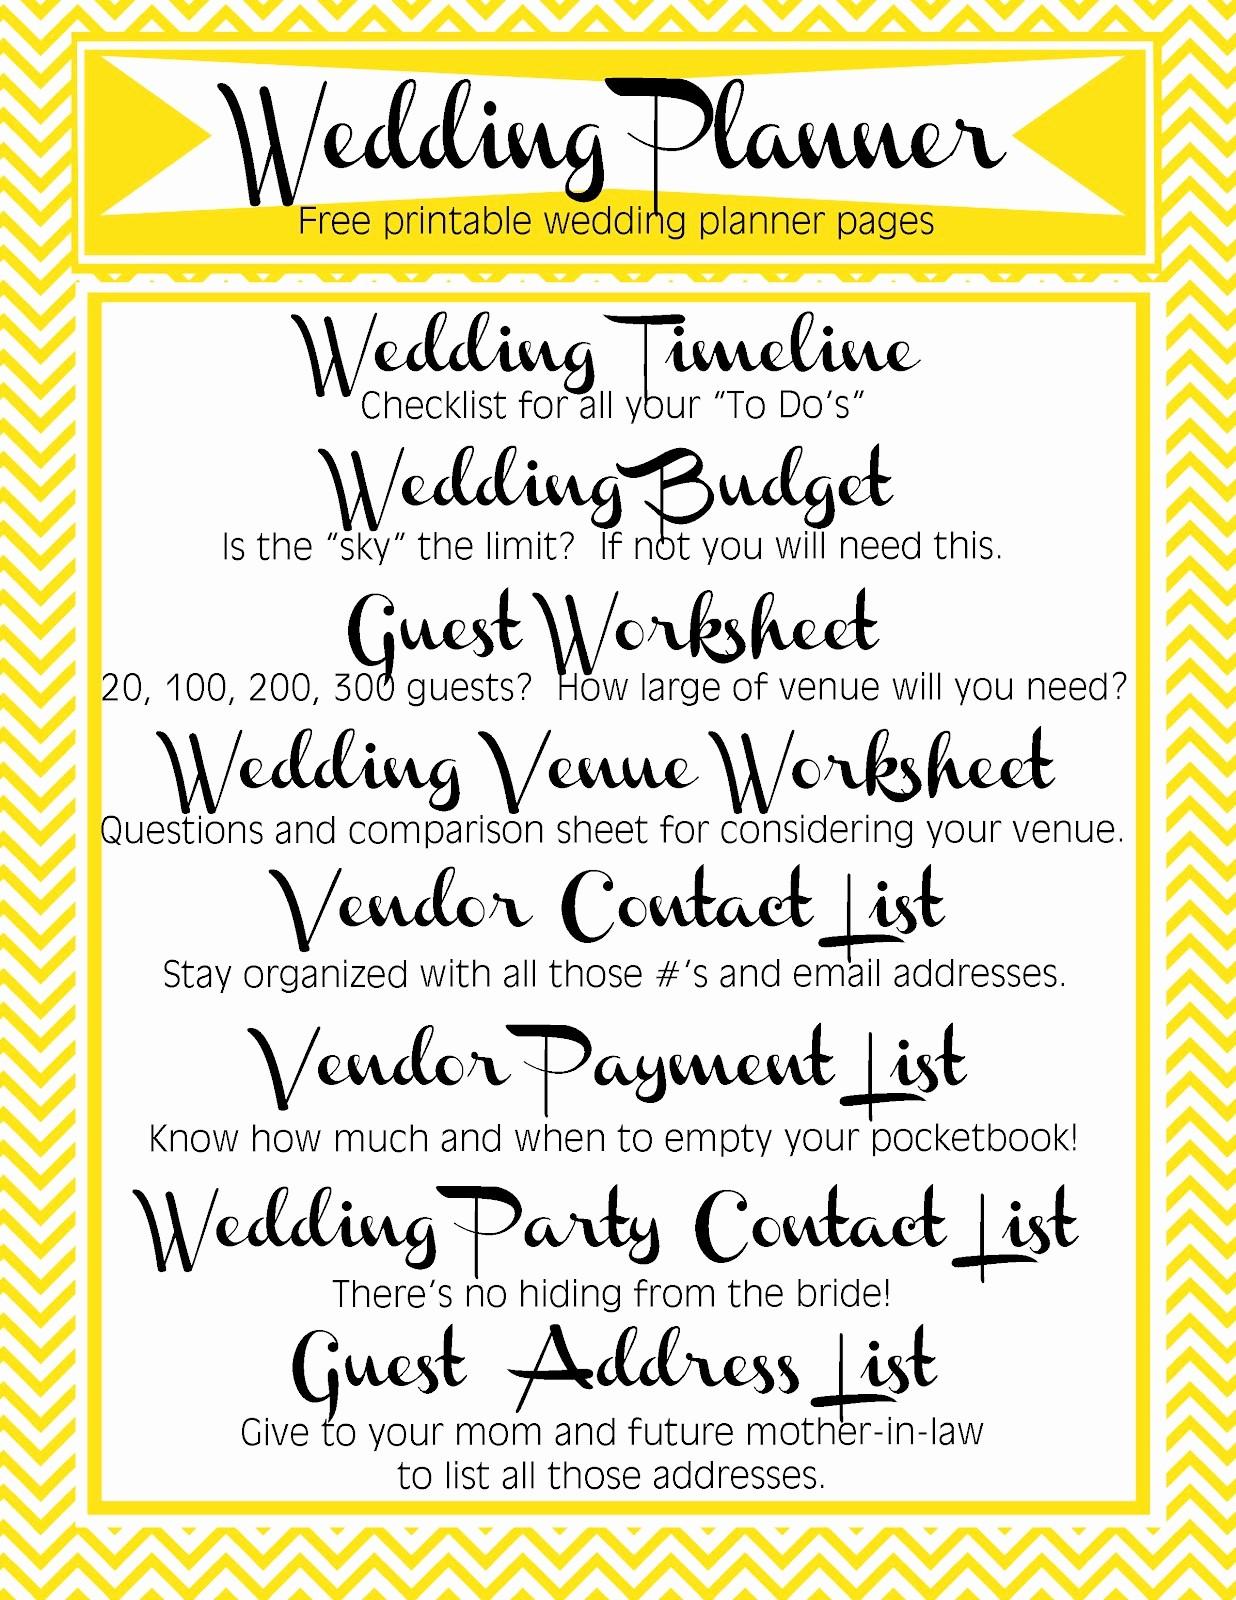 Wedding Guest List Worksheet Printable Fresh Free Printable Wedding Planner Pages Video Search Engine